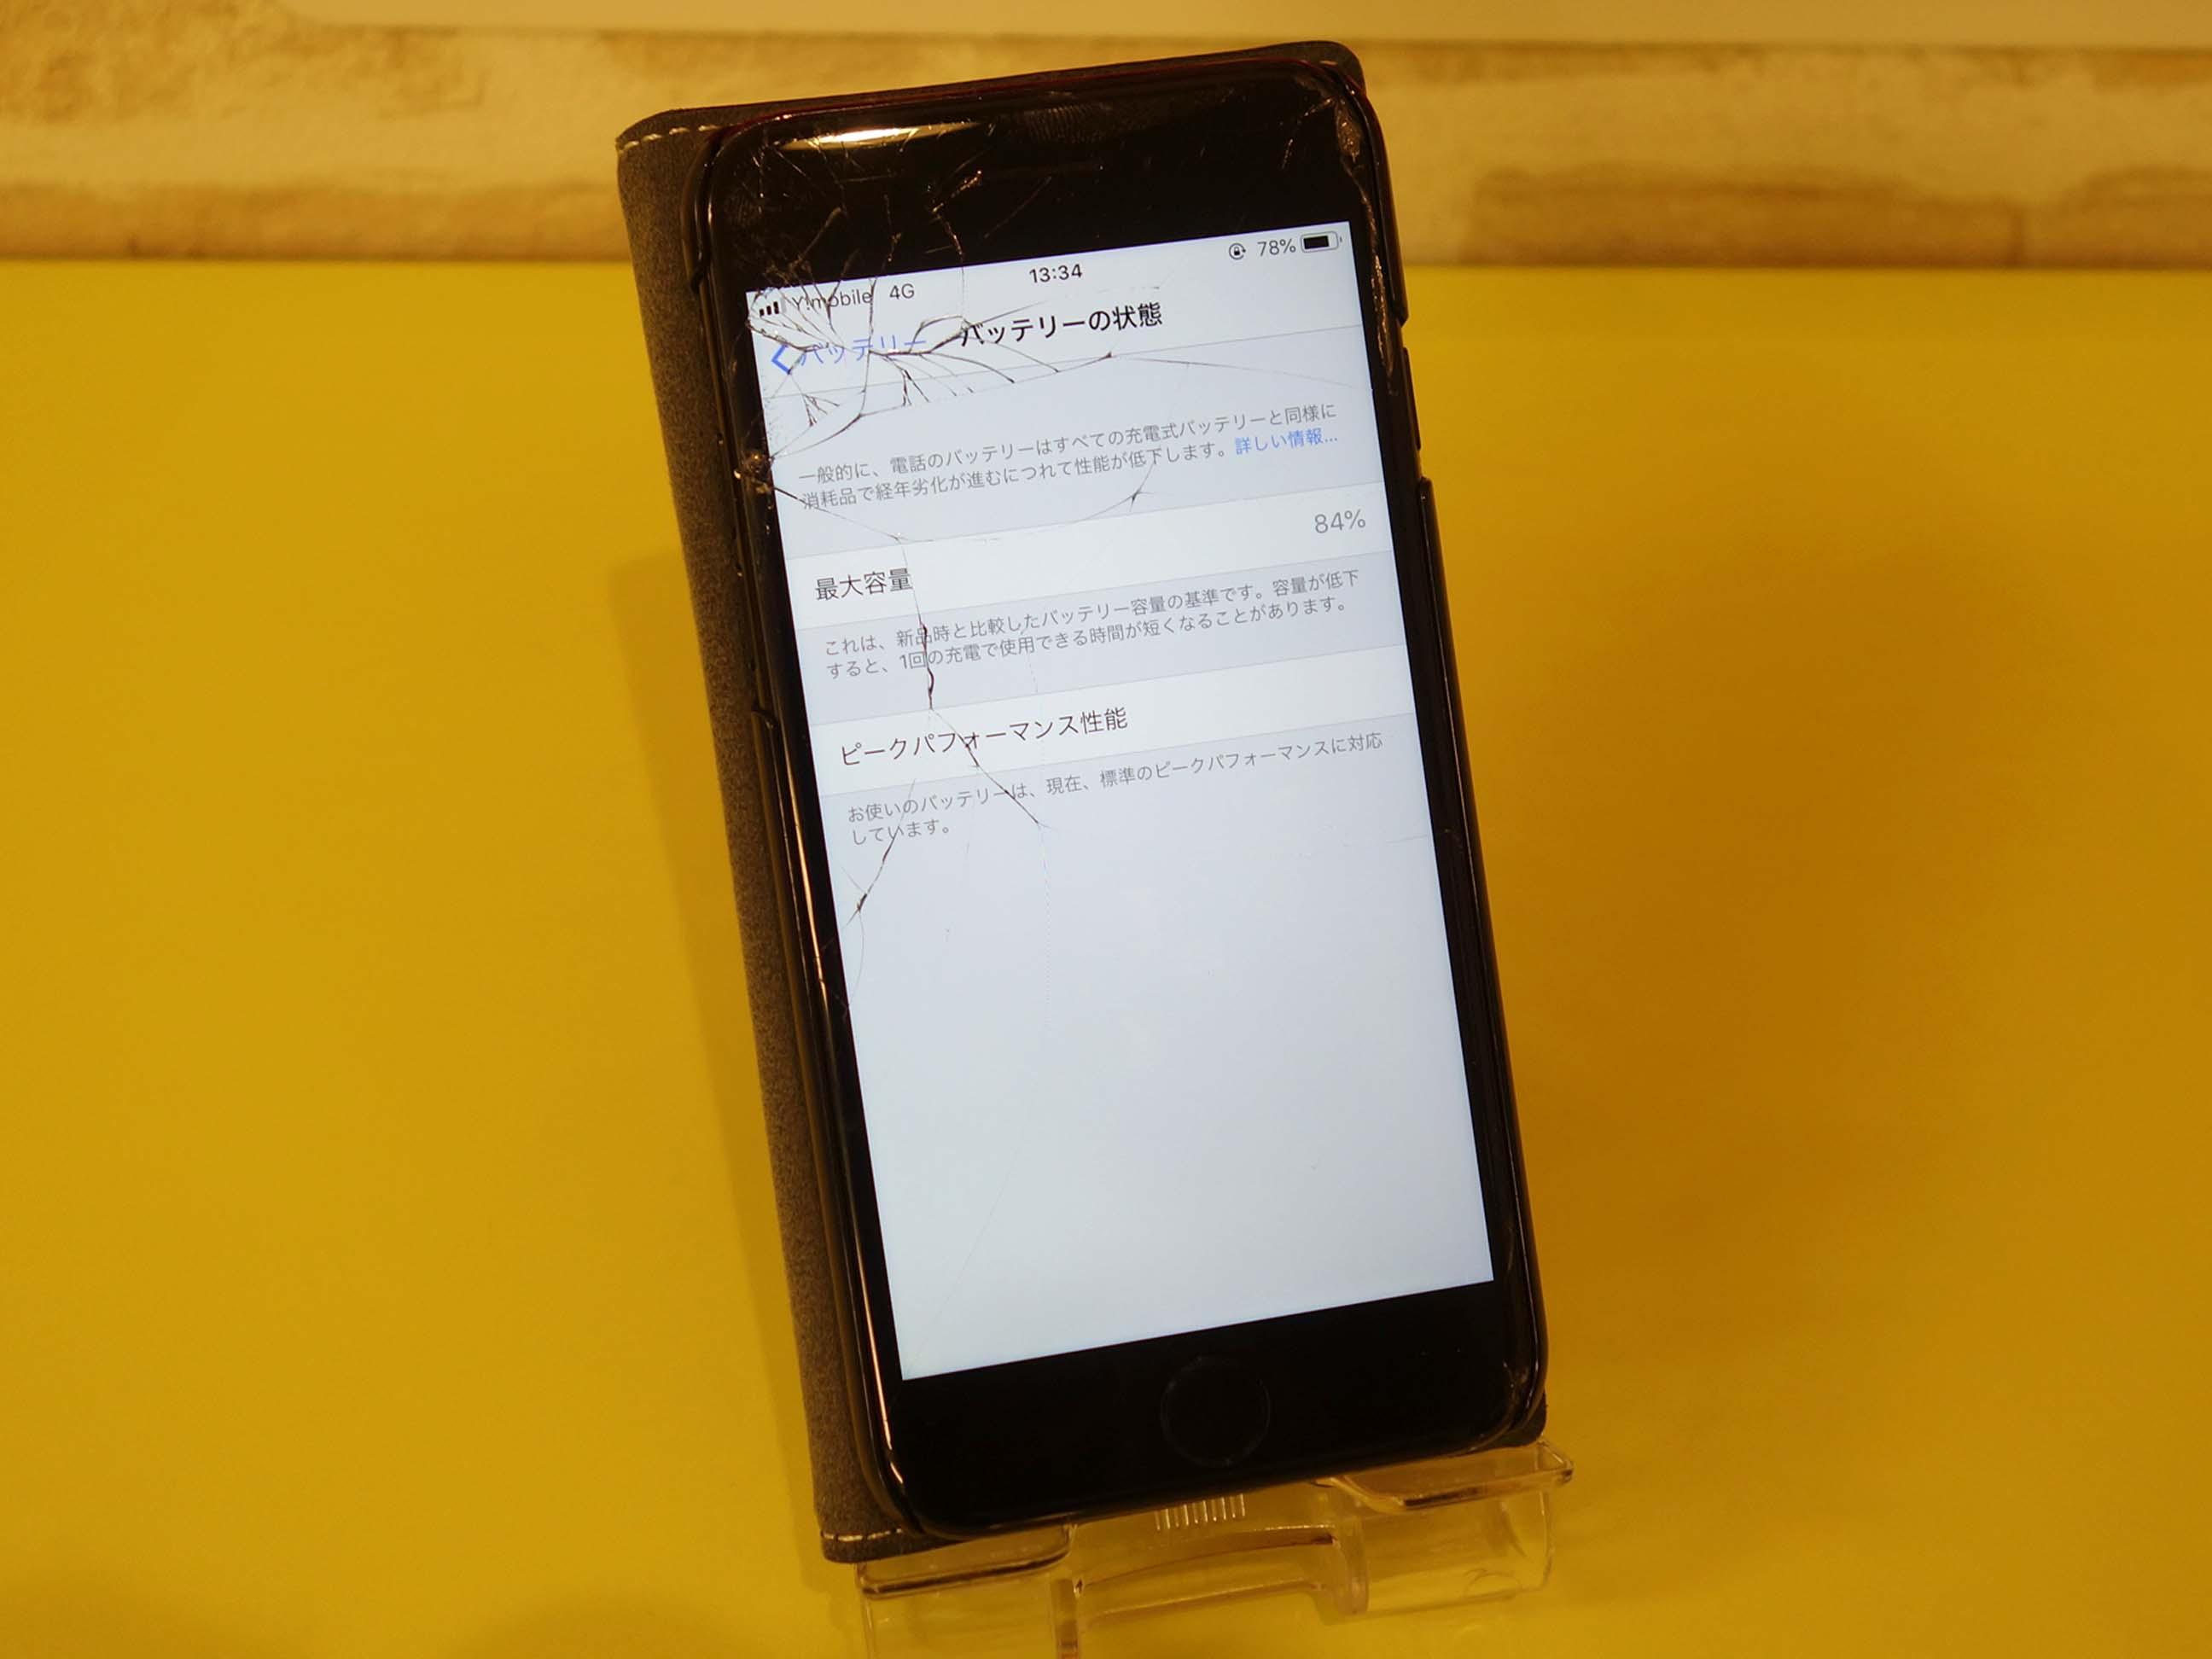 iPhone7のガラス&バッテリー交換修理に清須市からご来店!アイフォン修理のクイック名古屋